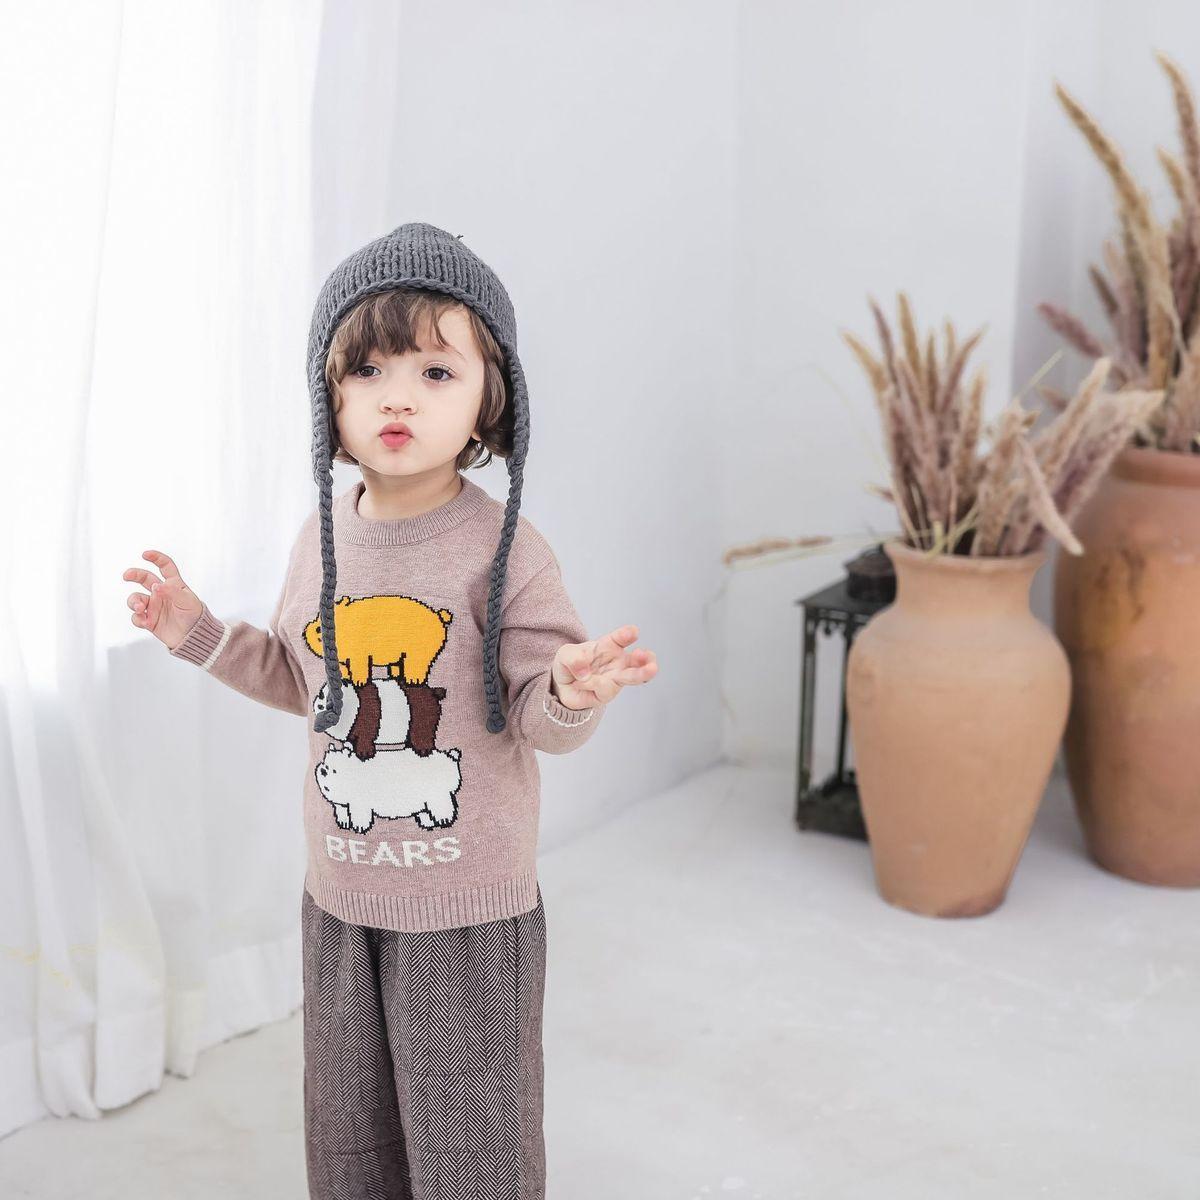 b713d87a9 Barrou Children S Garment Autumn And Winter 2018 New Pattern In ...